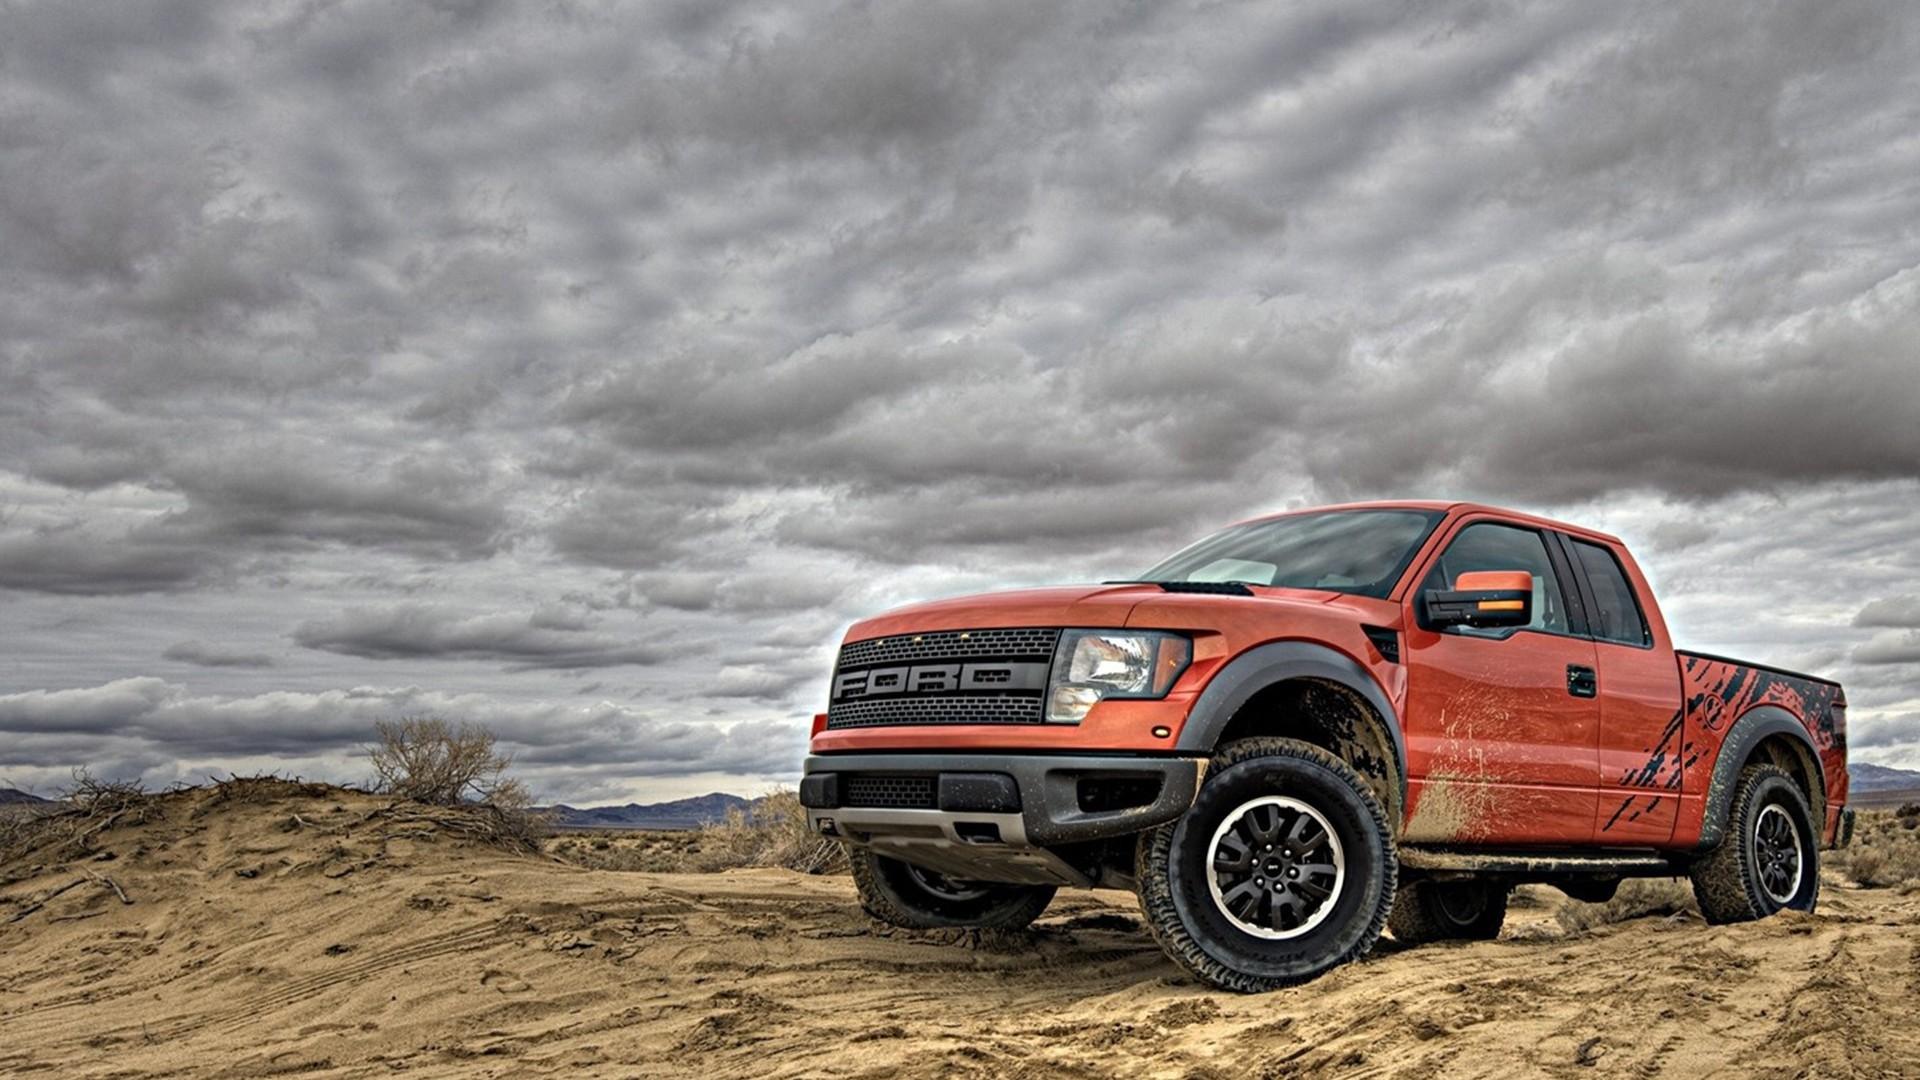 2018 Ford Raptor Custom 2019 2020 Upcoming Cars